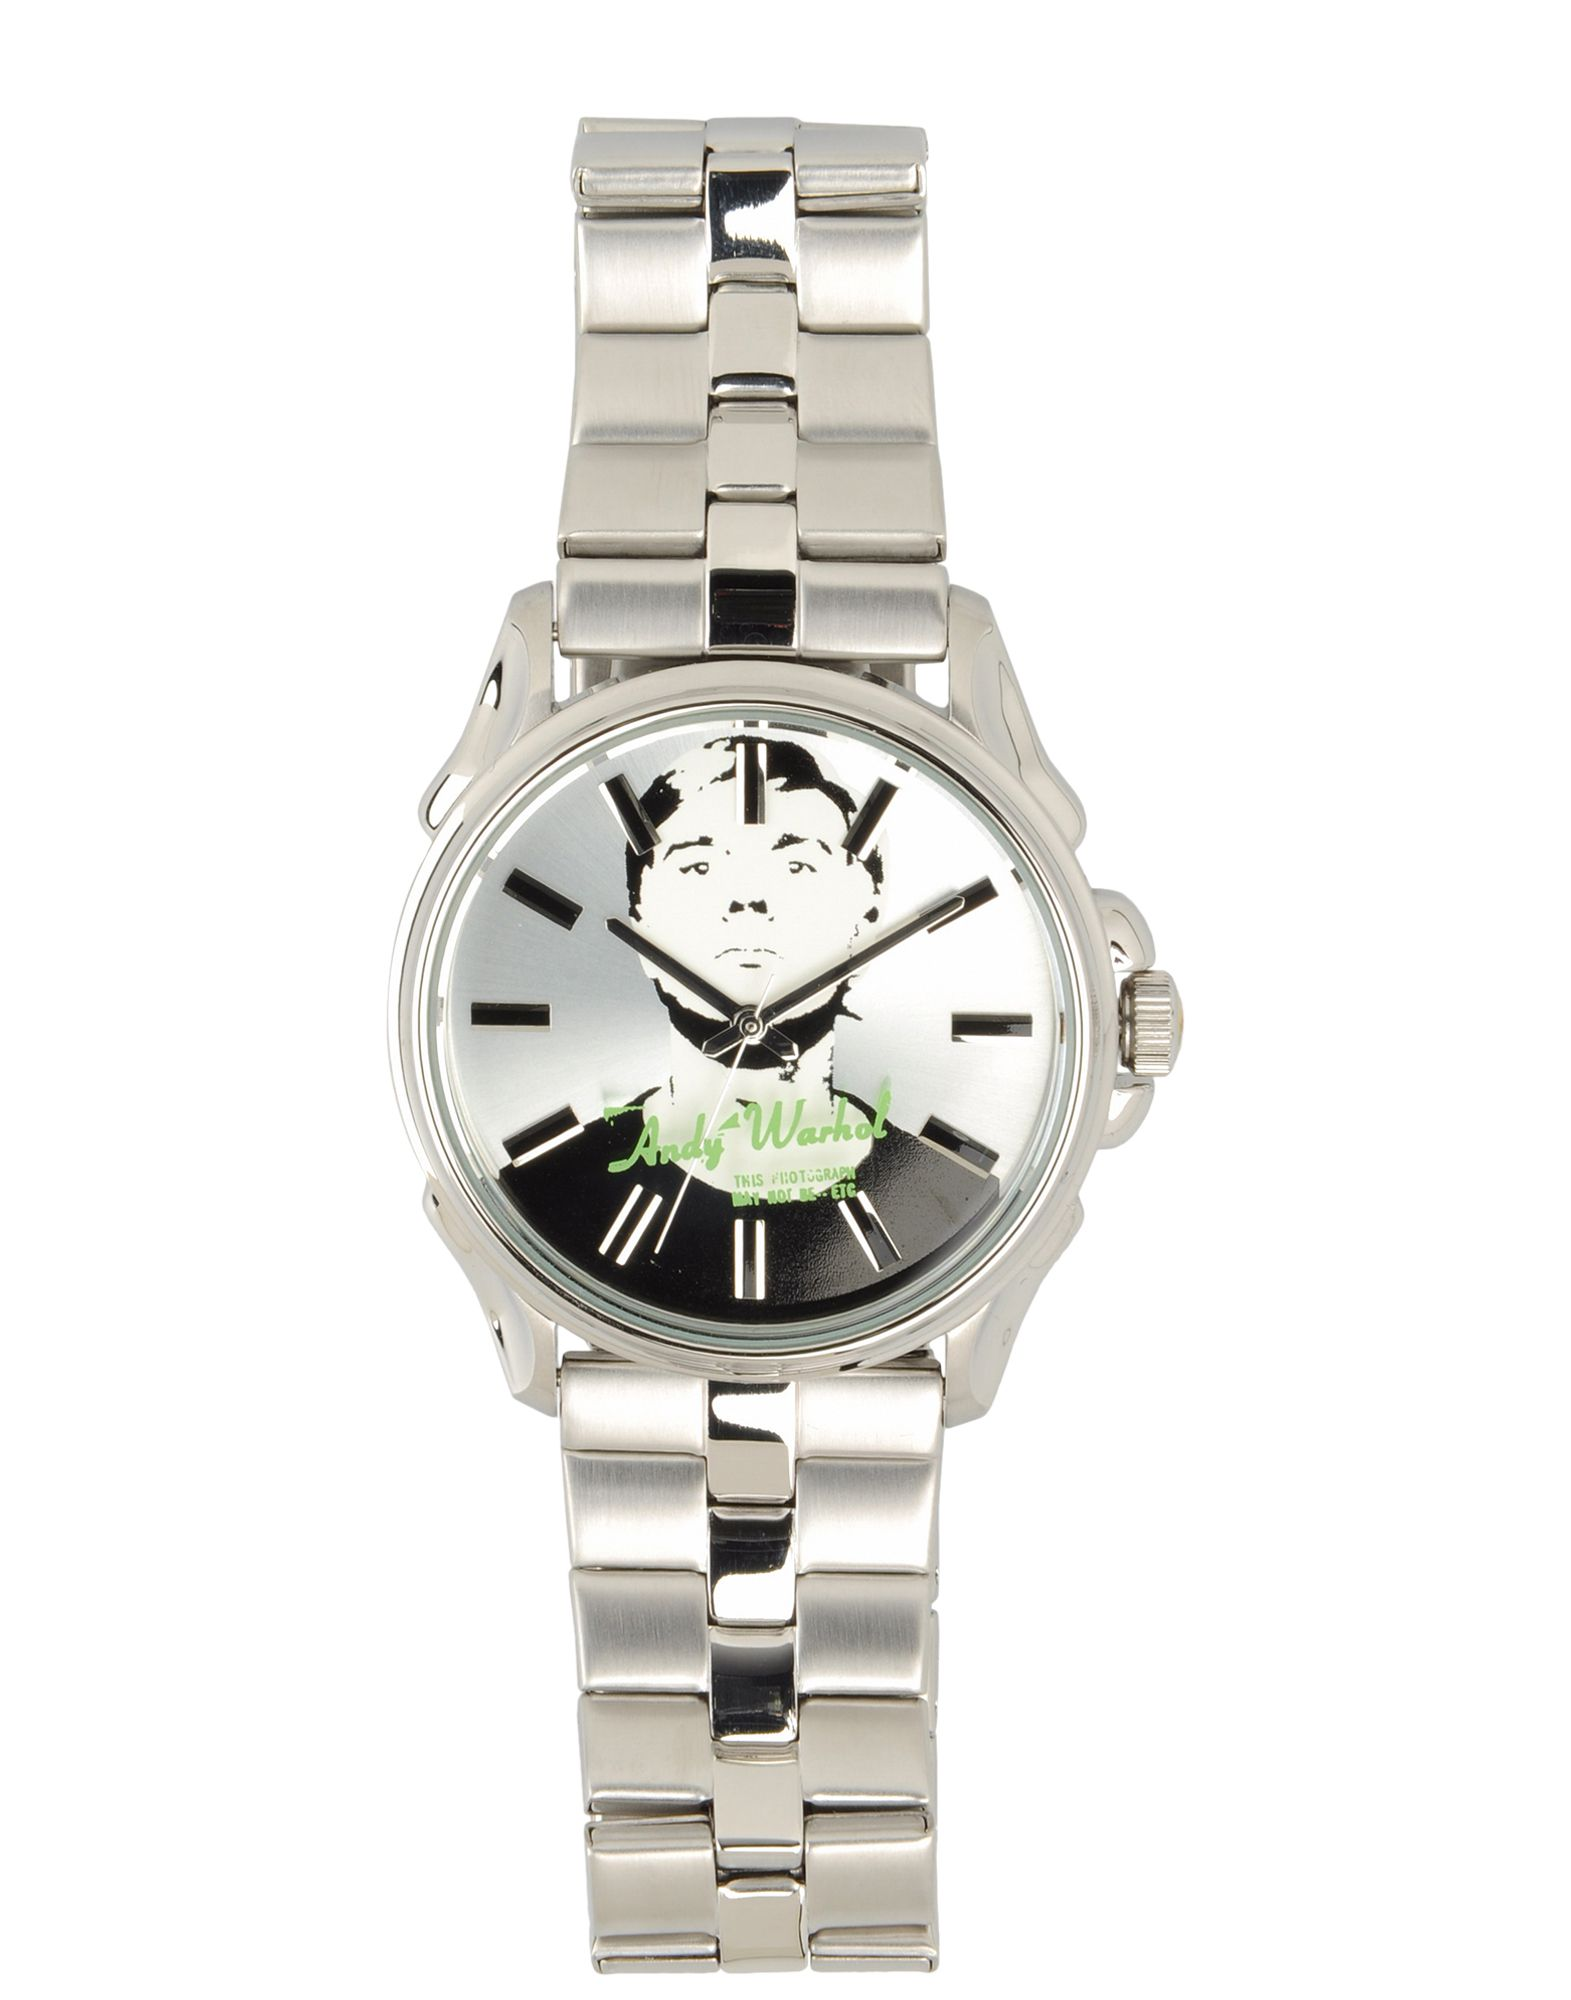 ANDY WARHOL Wrist watches